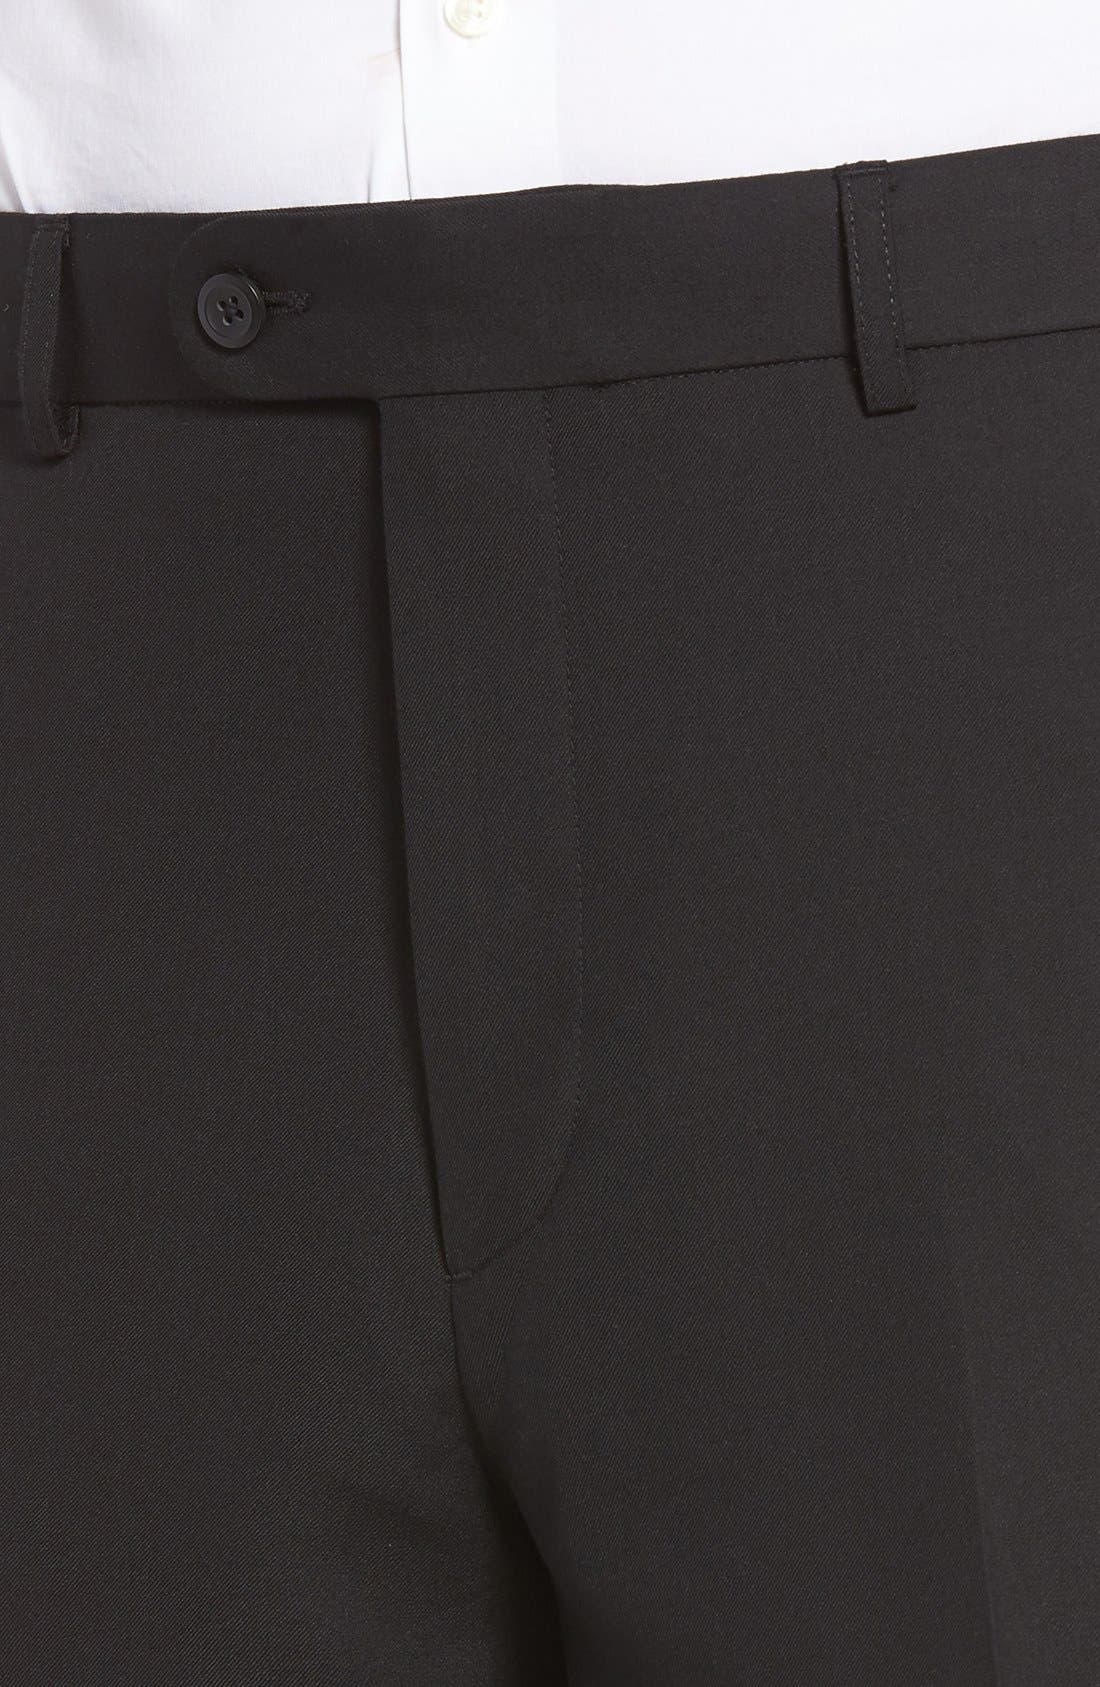 'Travel Genius - Hawk' Flat Front Pants,                             Alternate thumbnail 21, color,